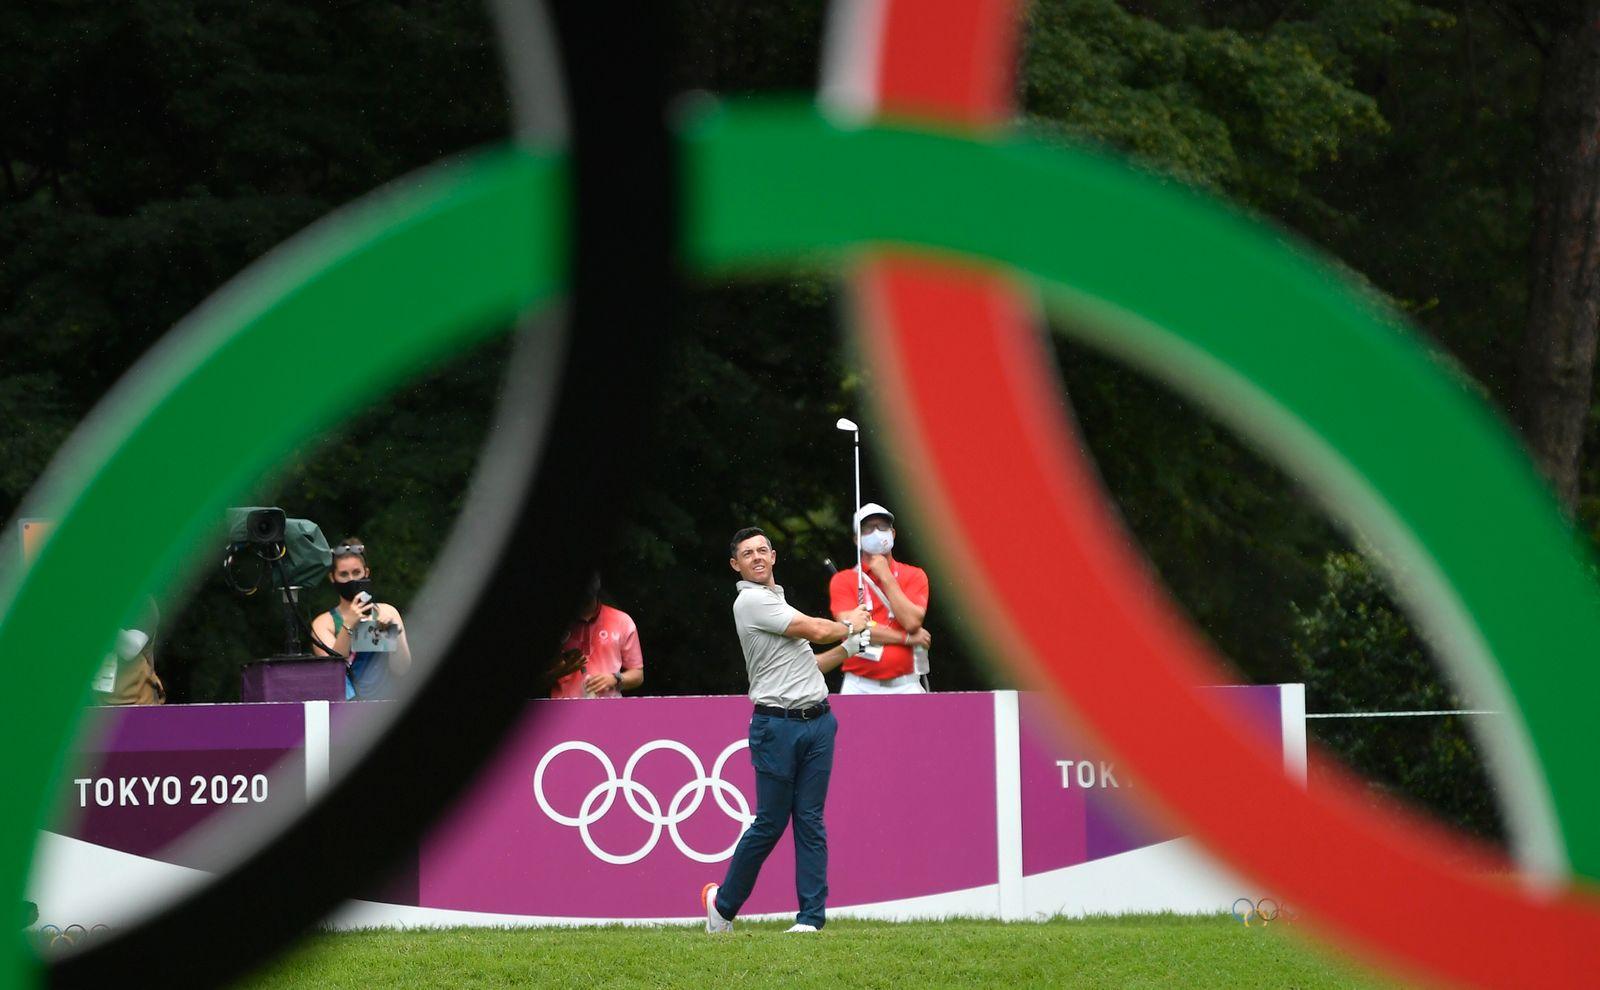 Golf - Men's Individual - Final - Round 1